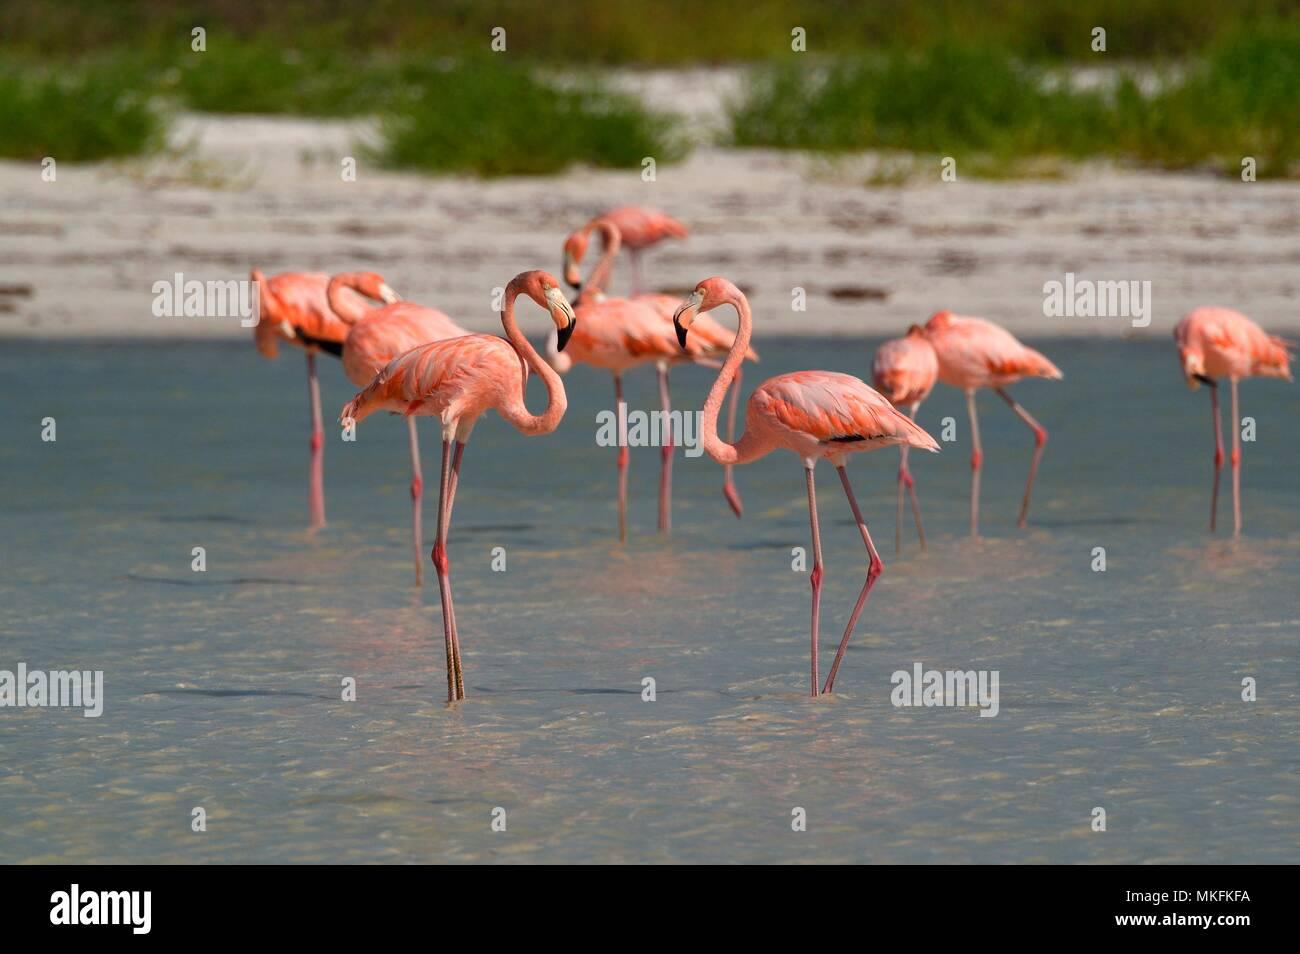 American Flamingo (Phoenicopterus ruber ruber) on the shore, Caribbean Sea, Holbox island, Yucatan Peninsula, Mexico - Stock Image